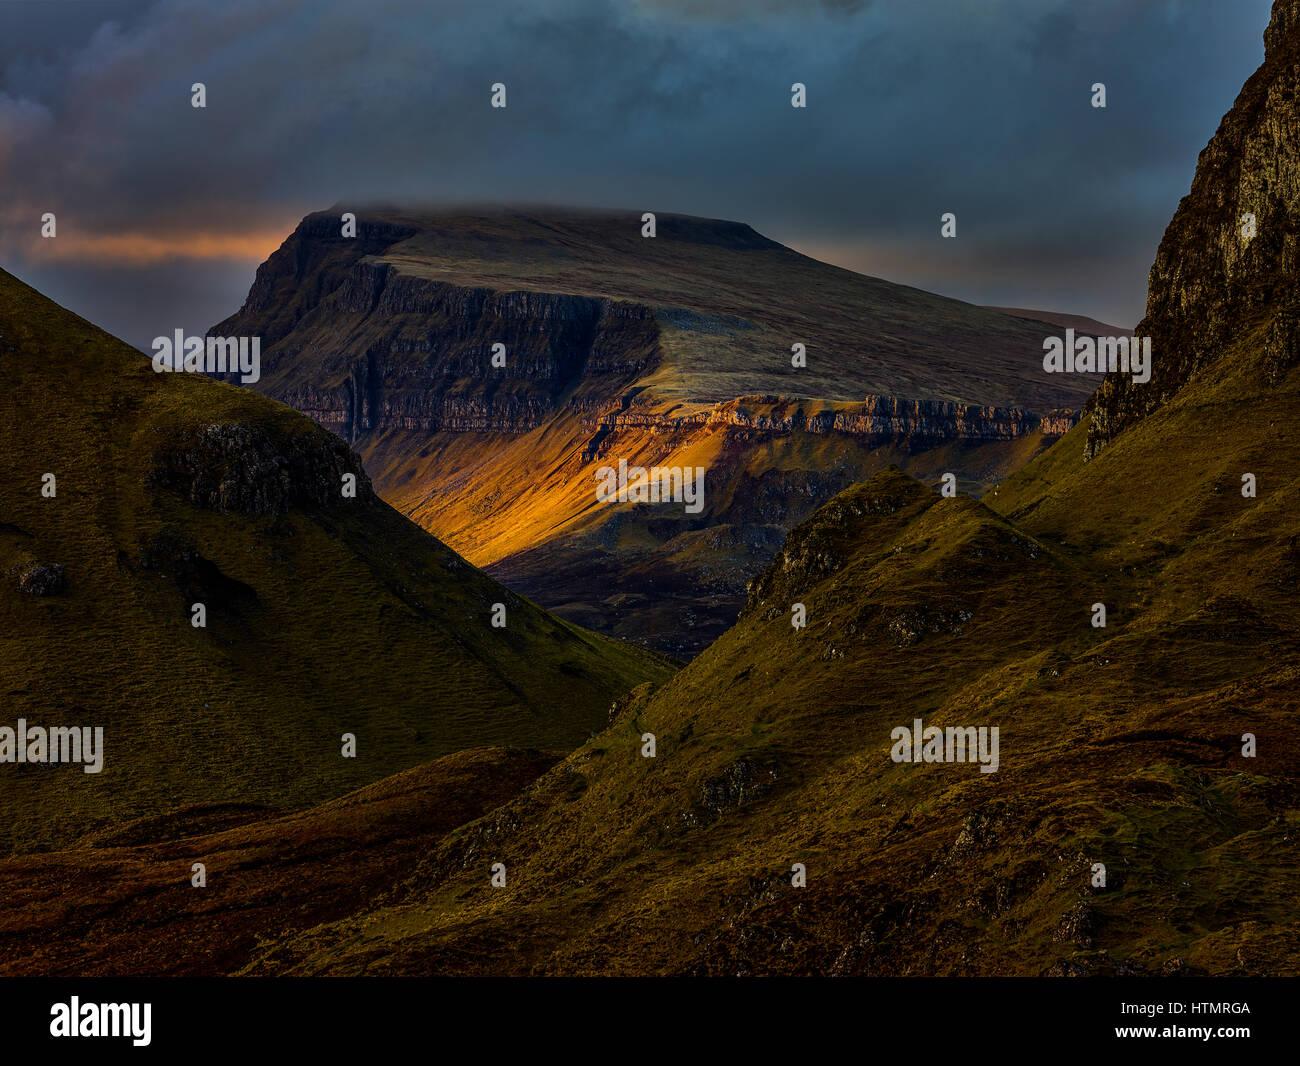 Fleeting Light at the Quiraing, Isle of Skye - Stock Image